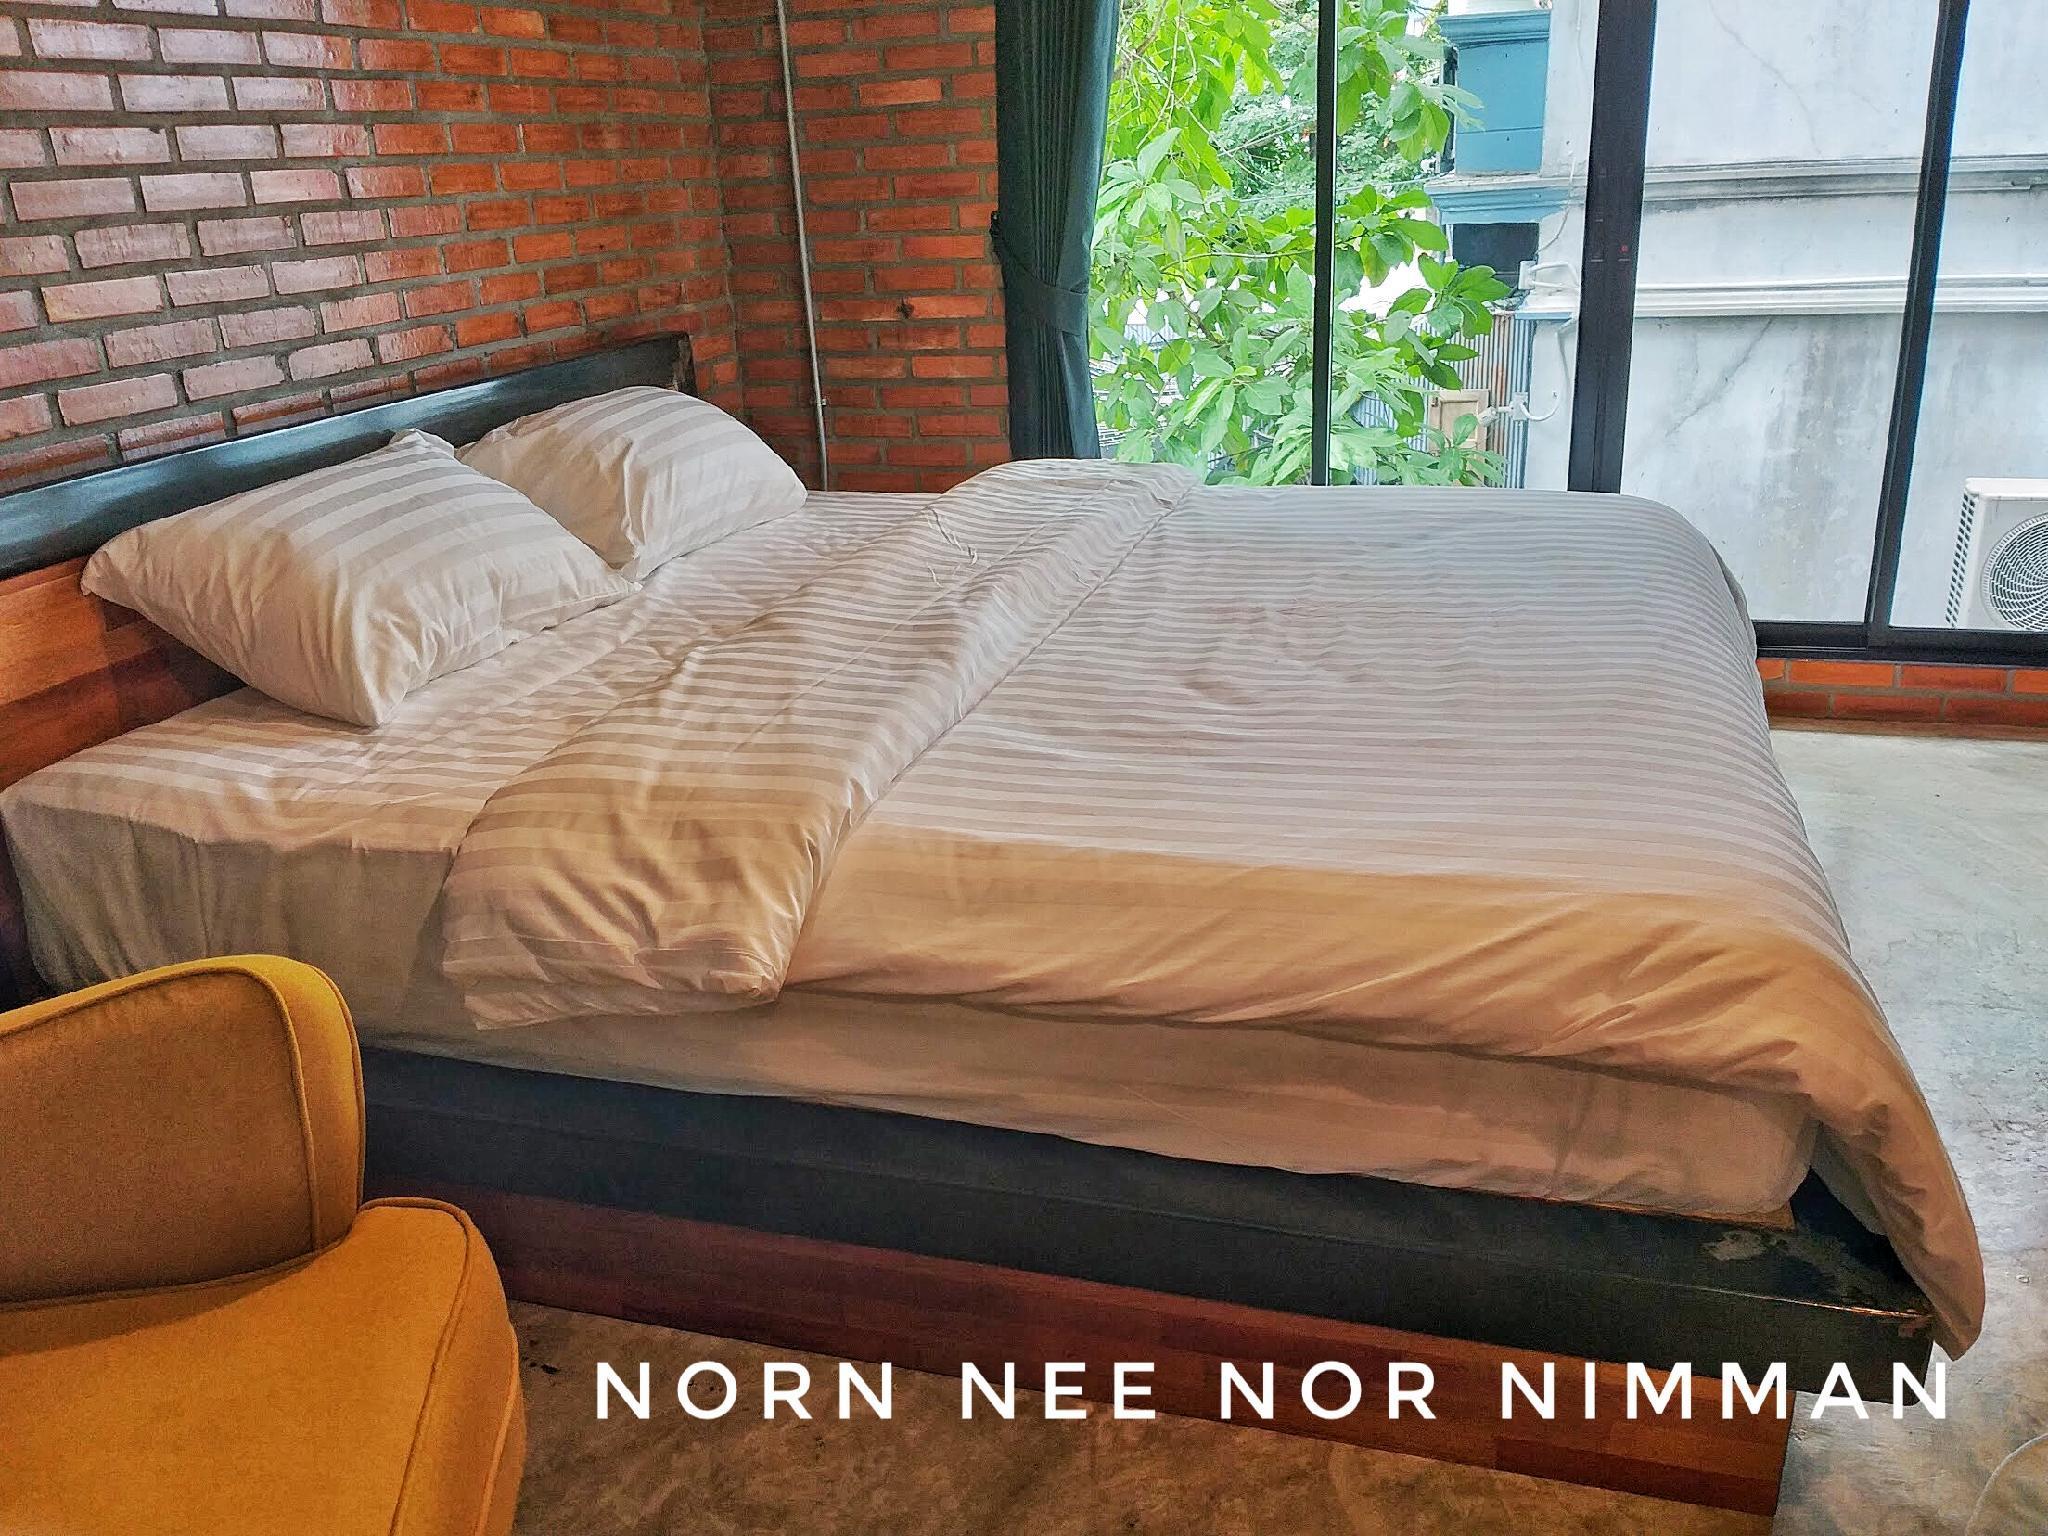 Norn Nee Nor HostelandCafe King Size 1